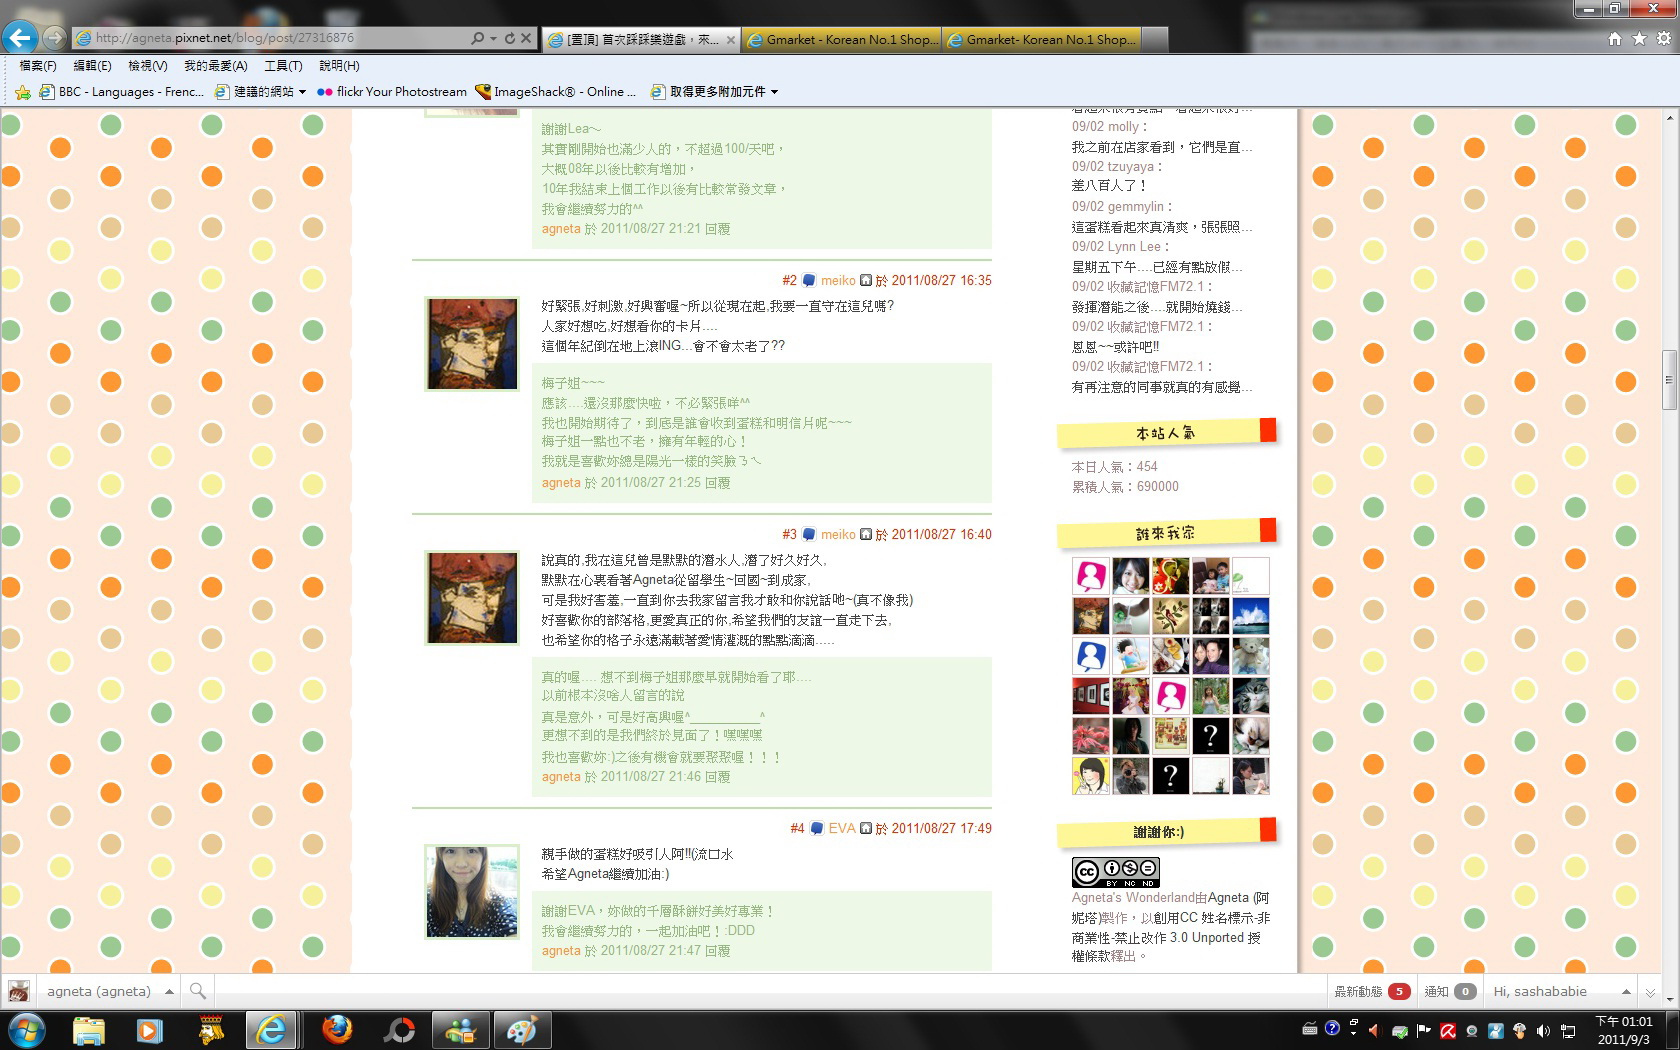 agneta_blog_celebration.jpg